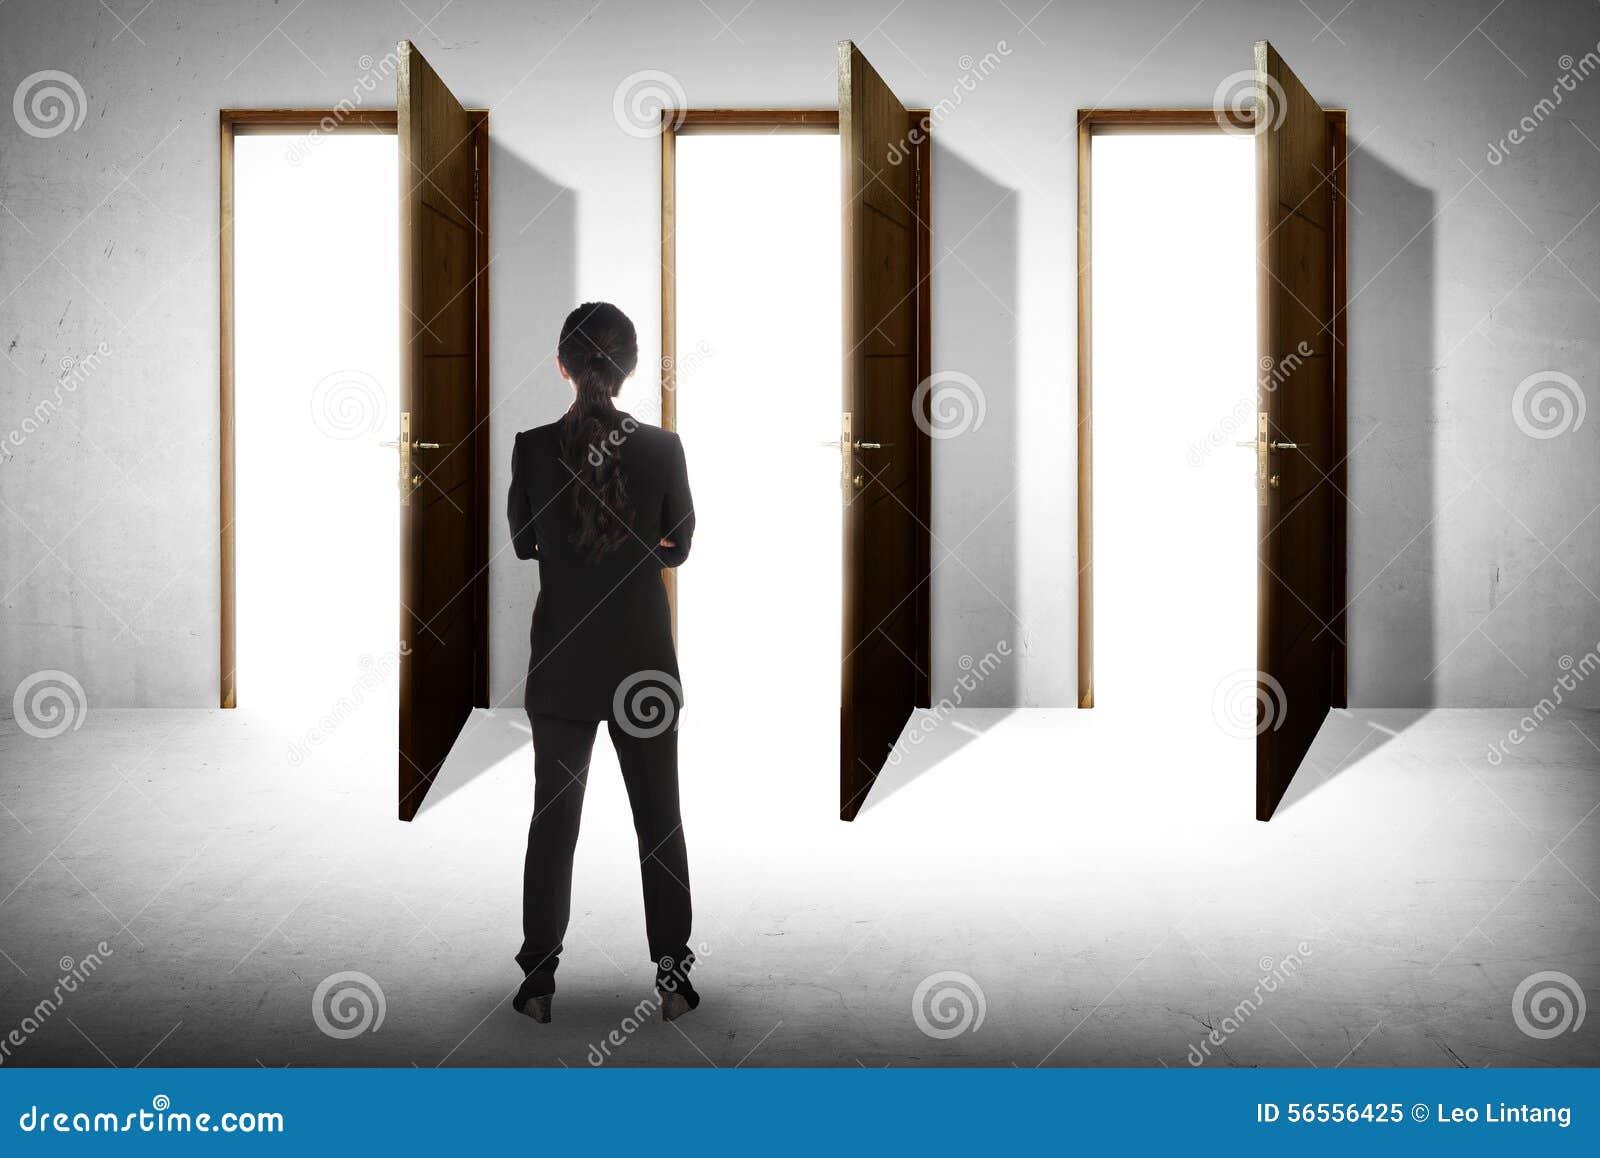 Download Η ασιατική επιχειρησιακή γυναίκα πρέπει να επιλέξει τις πόρτες Στοκ Εικόνα - εικόνα από πόρτες, έννοια: 56556425